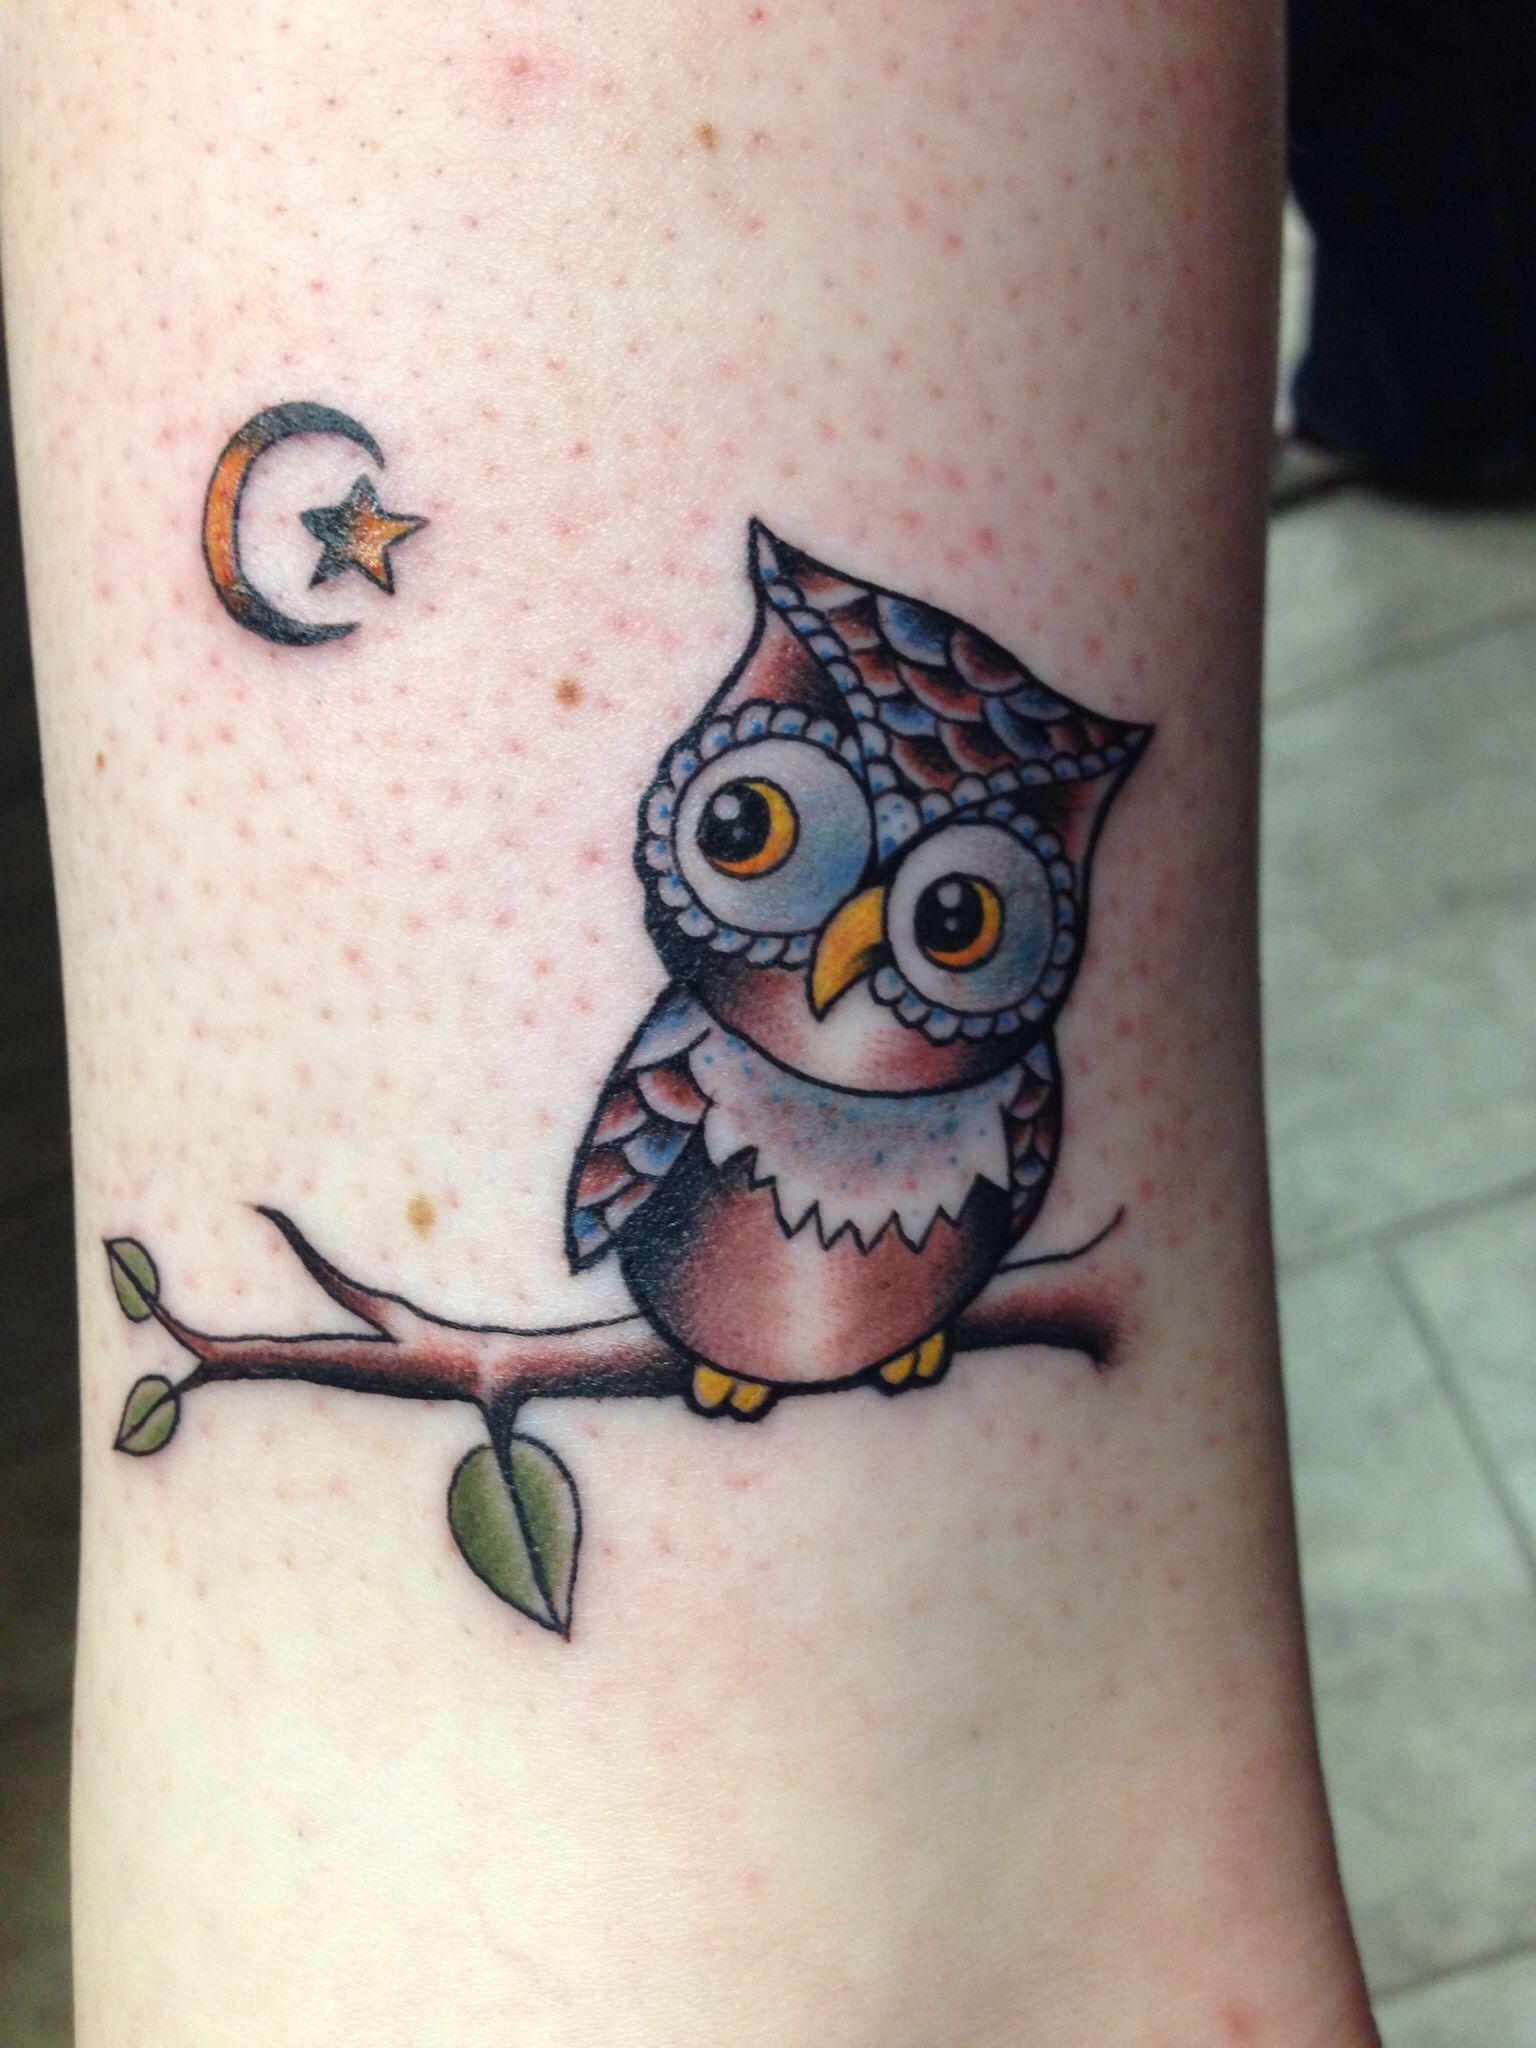 Owl Ankle Tattoo | My Tattoos | Pinterest | Ankle tattoos ...